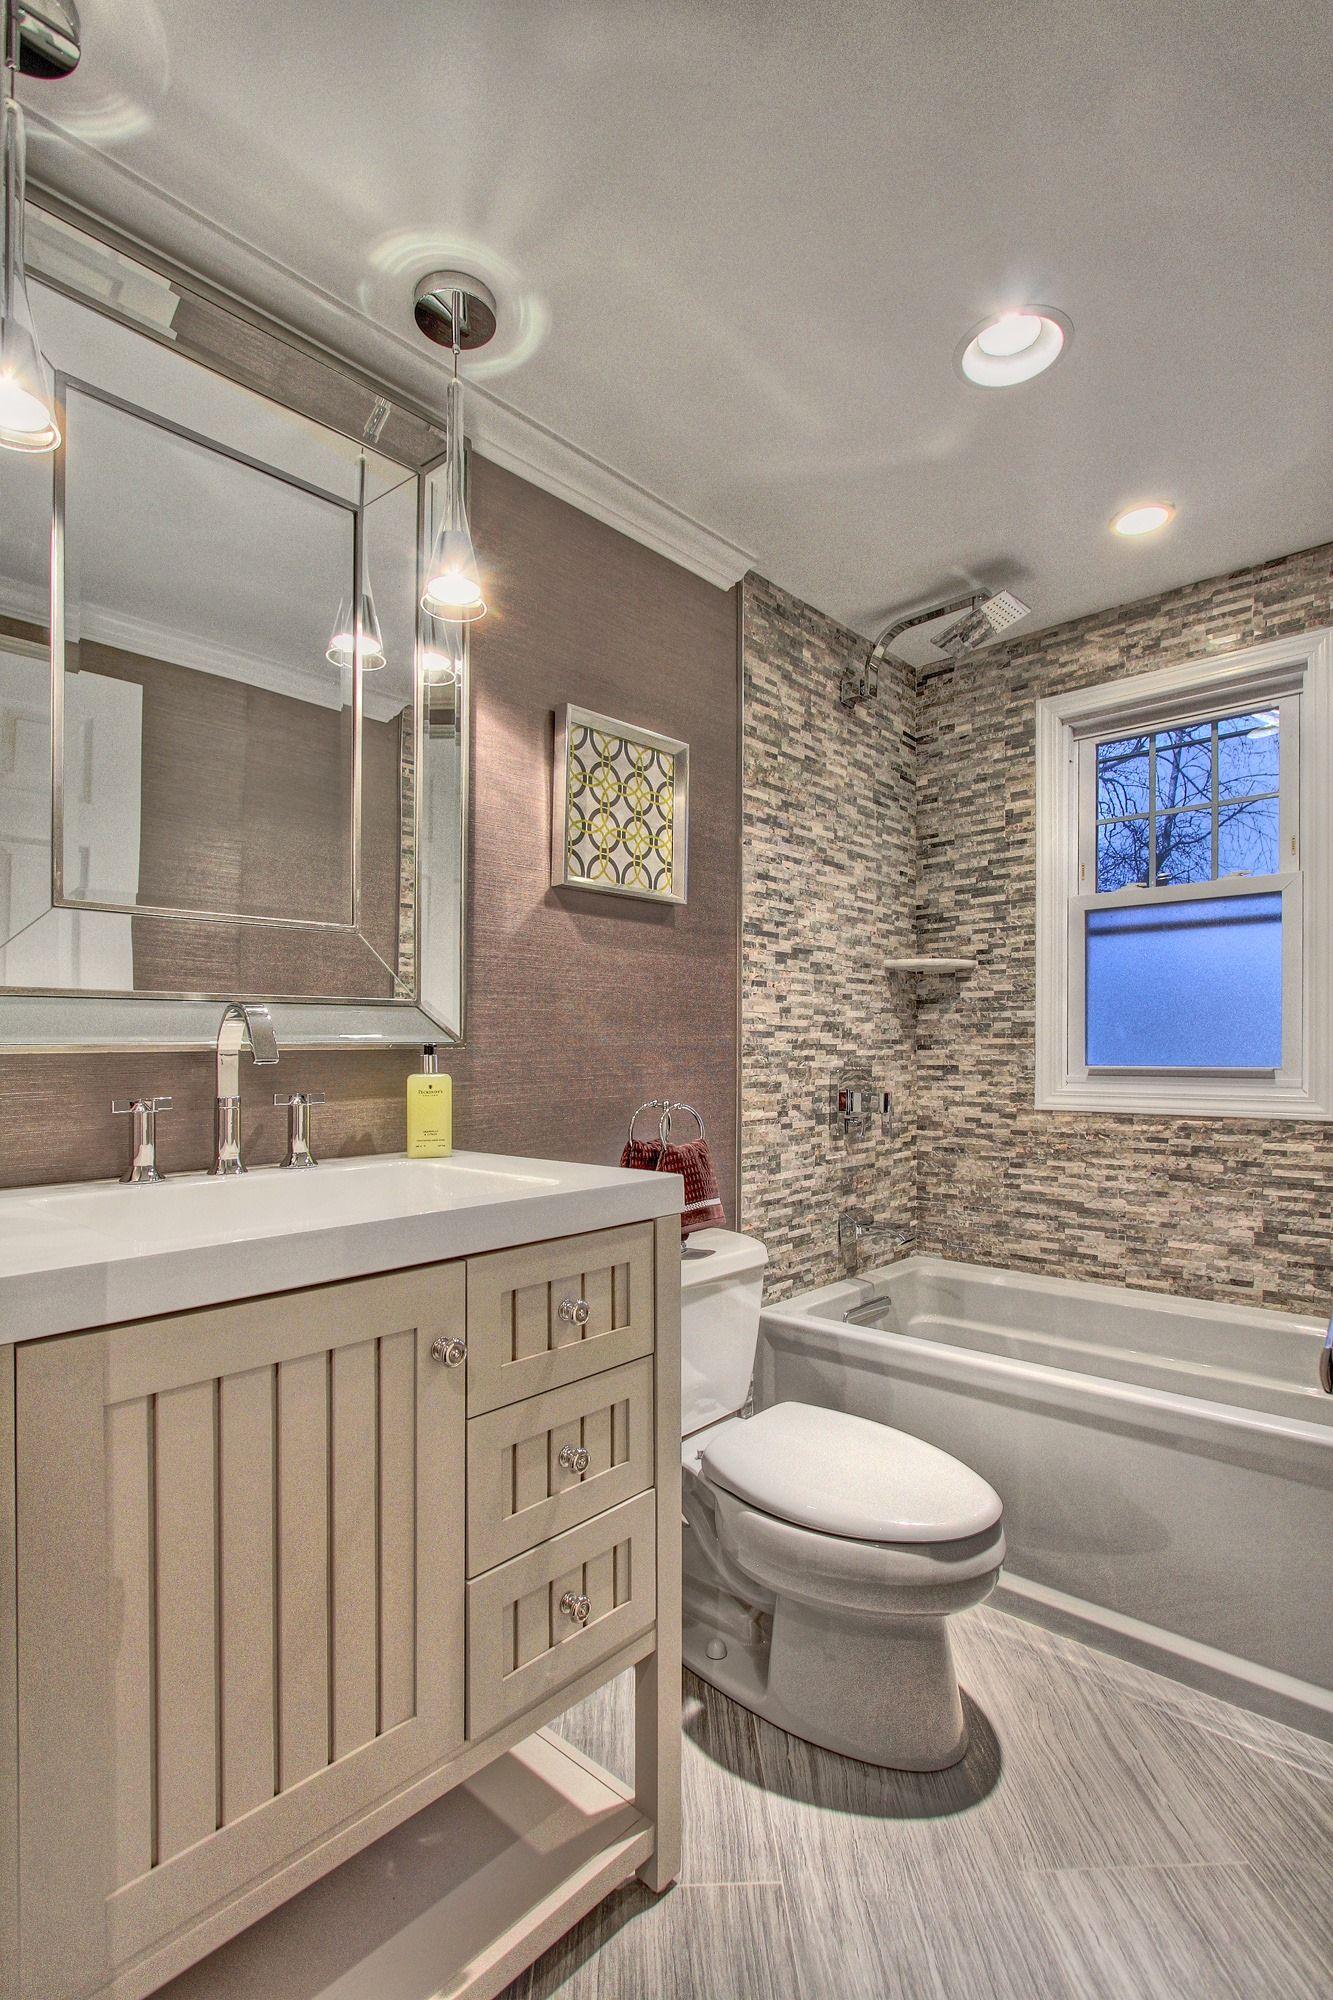 main floor bath ceramic tile floors, Allier vanity